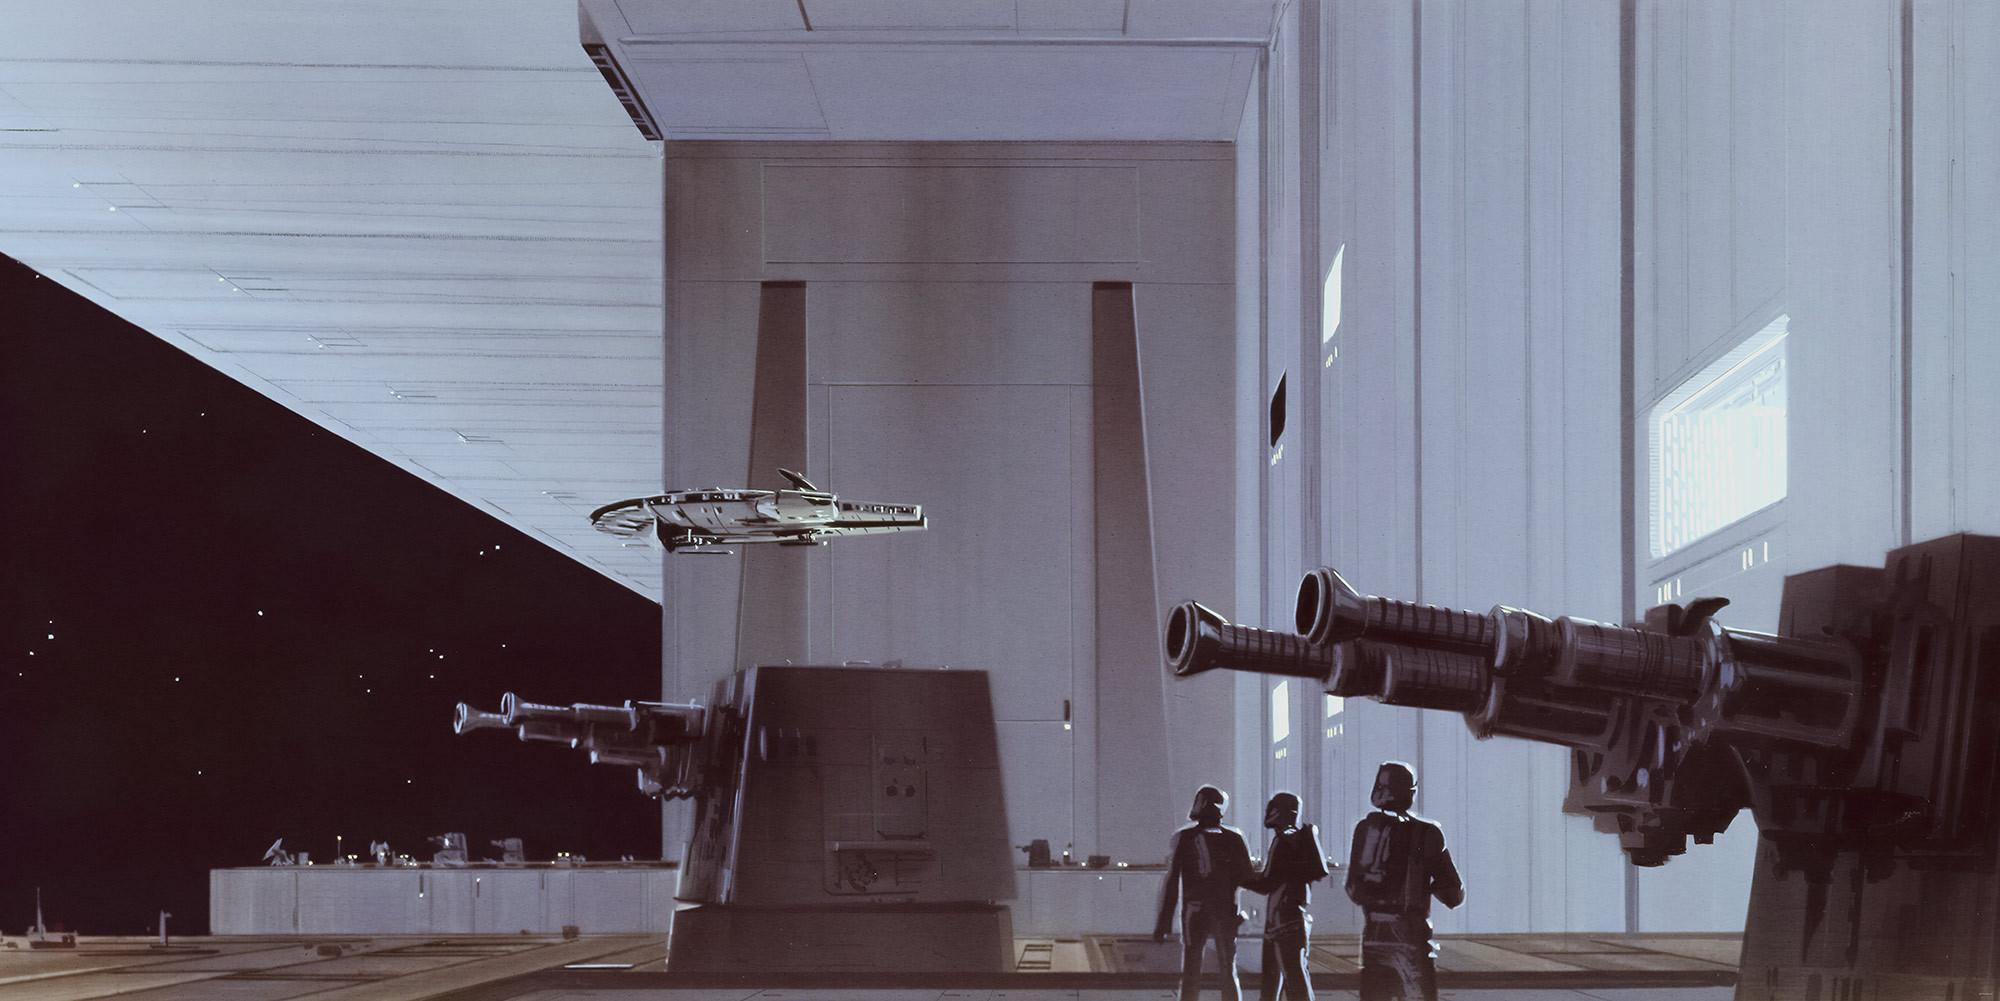 Star Wars Classic Rmq Death Star Hangar   Title Star - Star Wars Concept Art , HD Wallpaper & Backgrounds